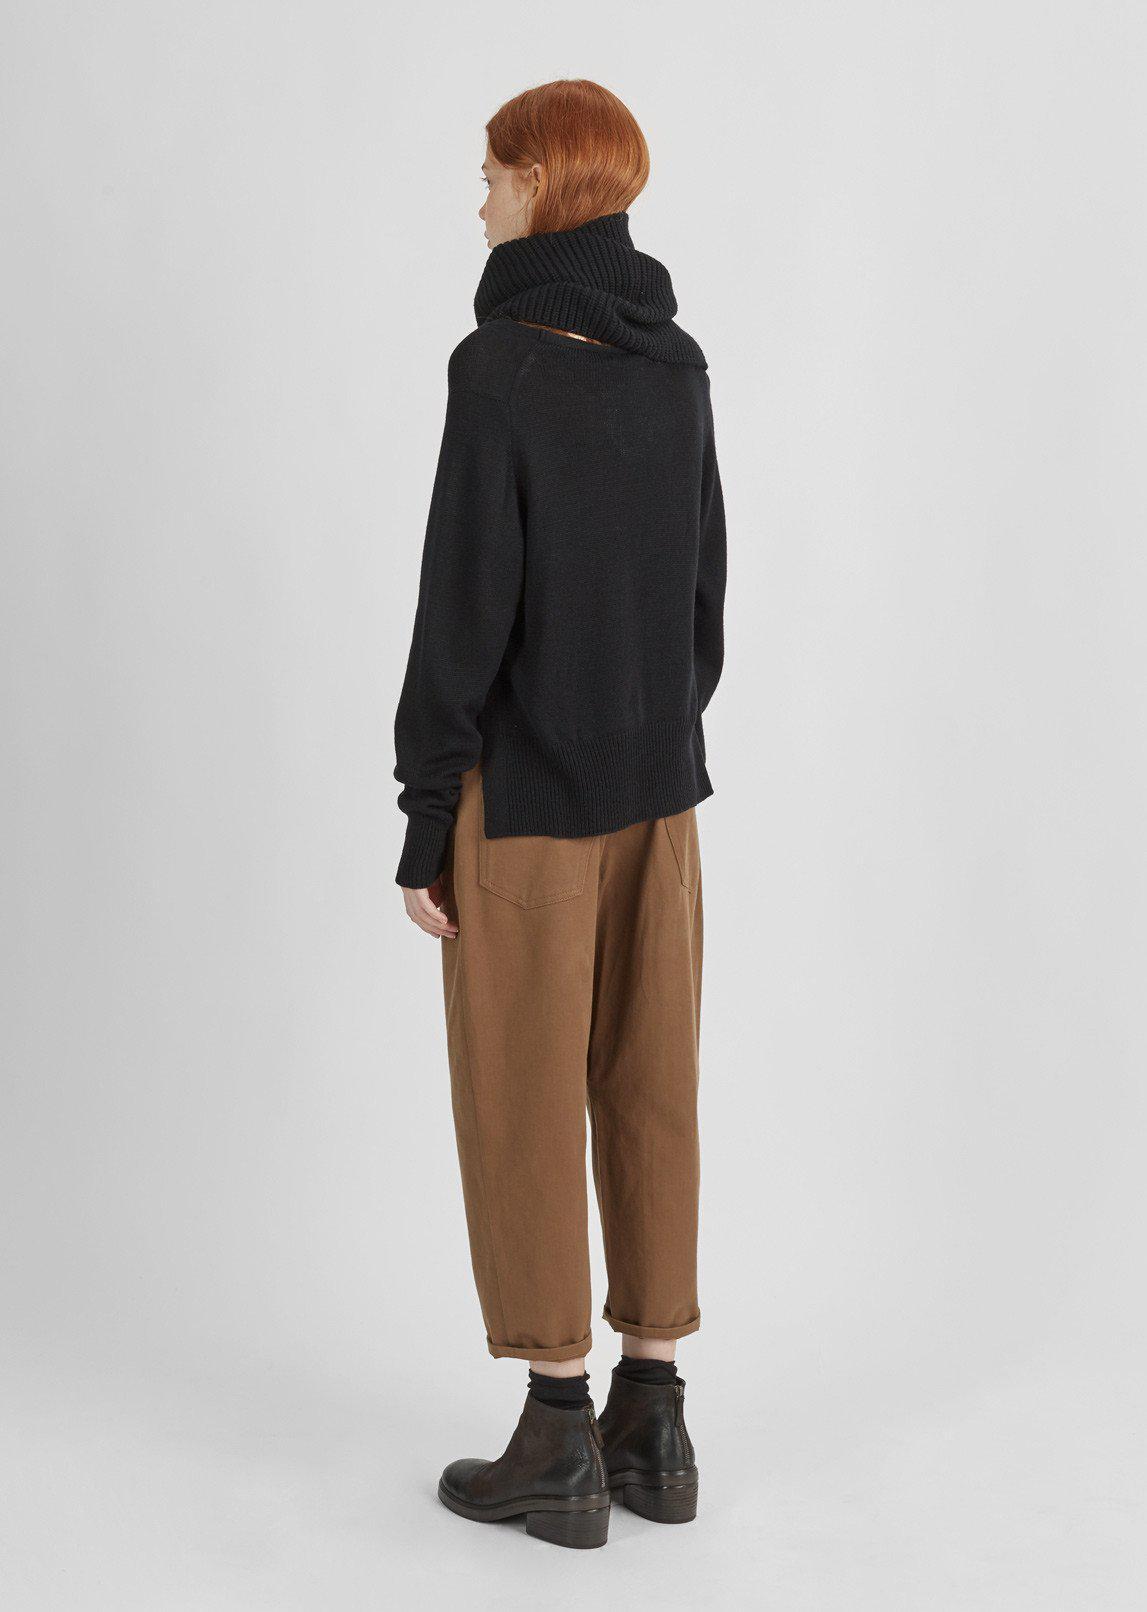 Y's Yohji Yamamoto Cotton Dropped Chino Pants in Brown